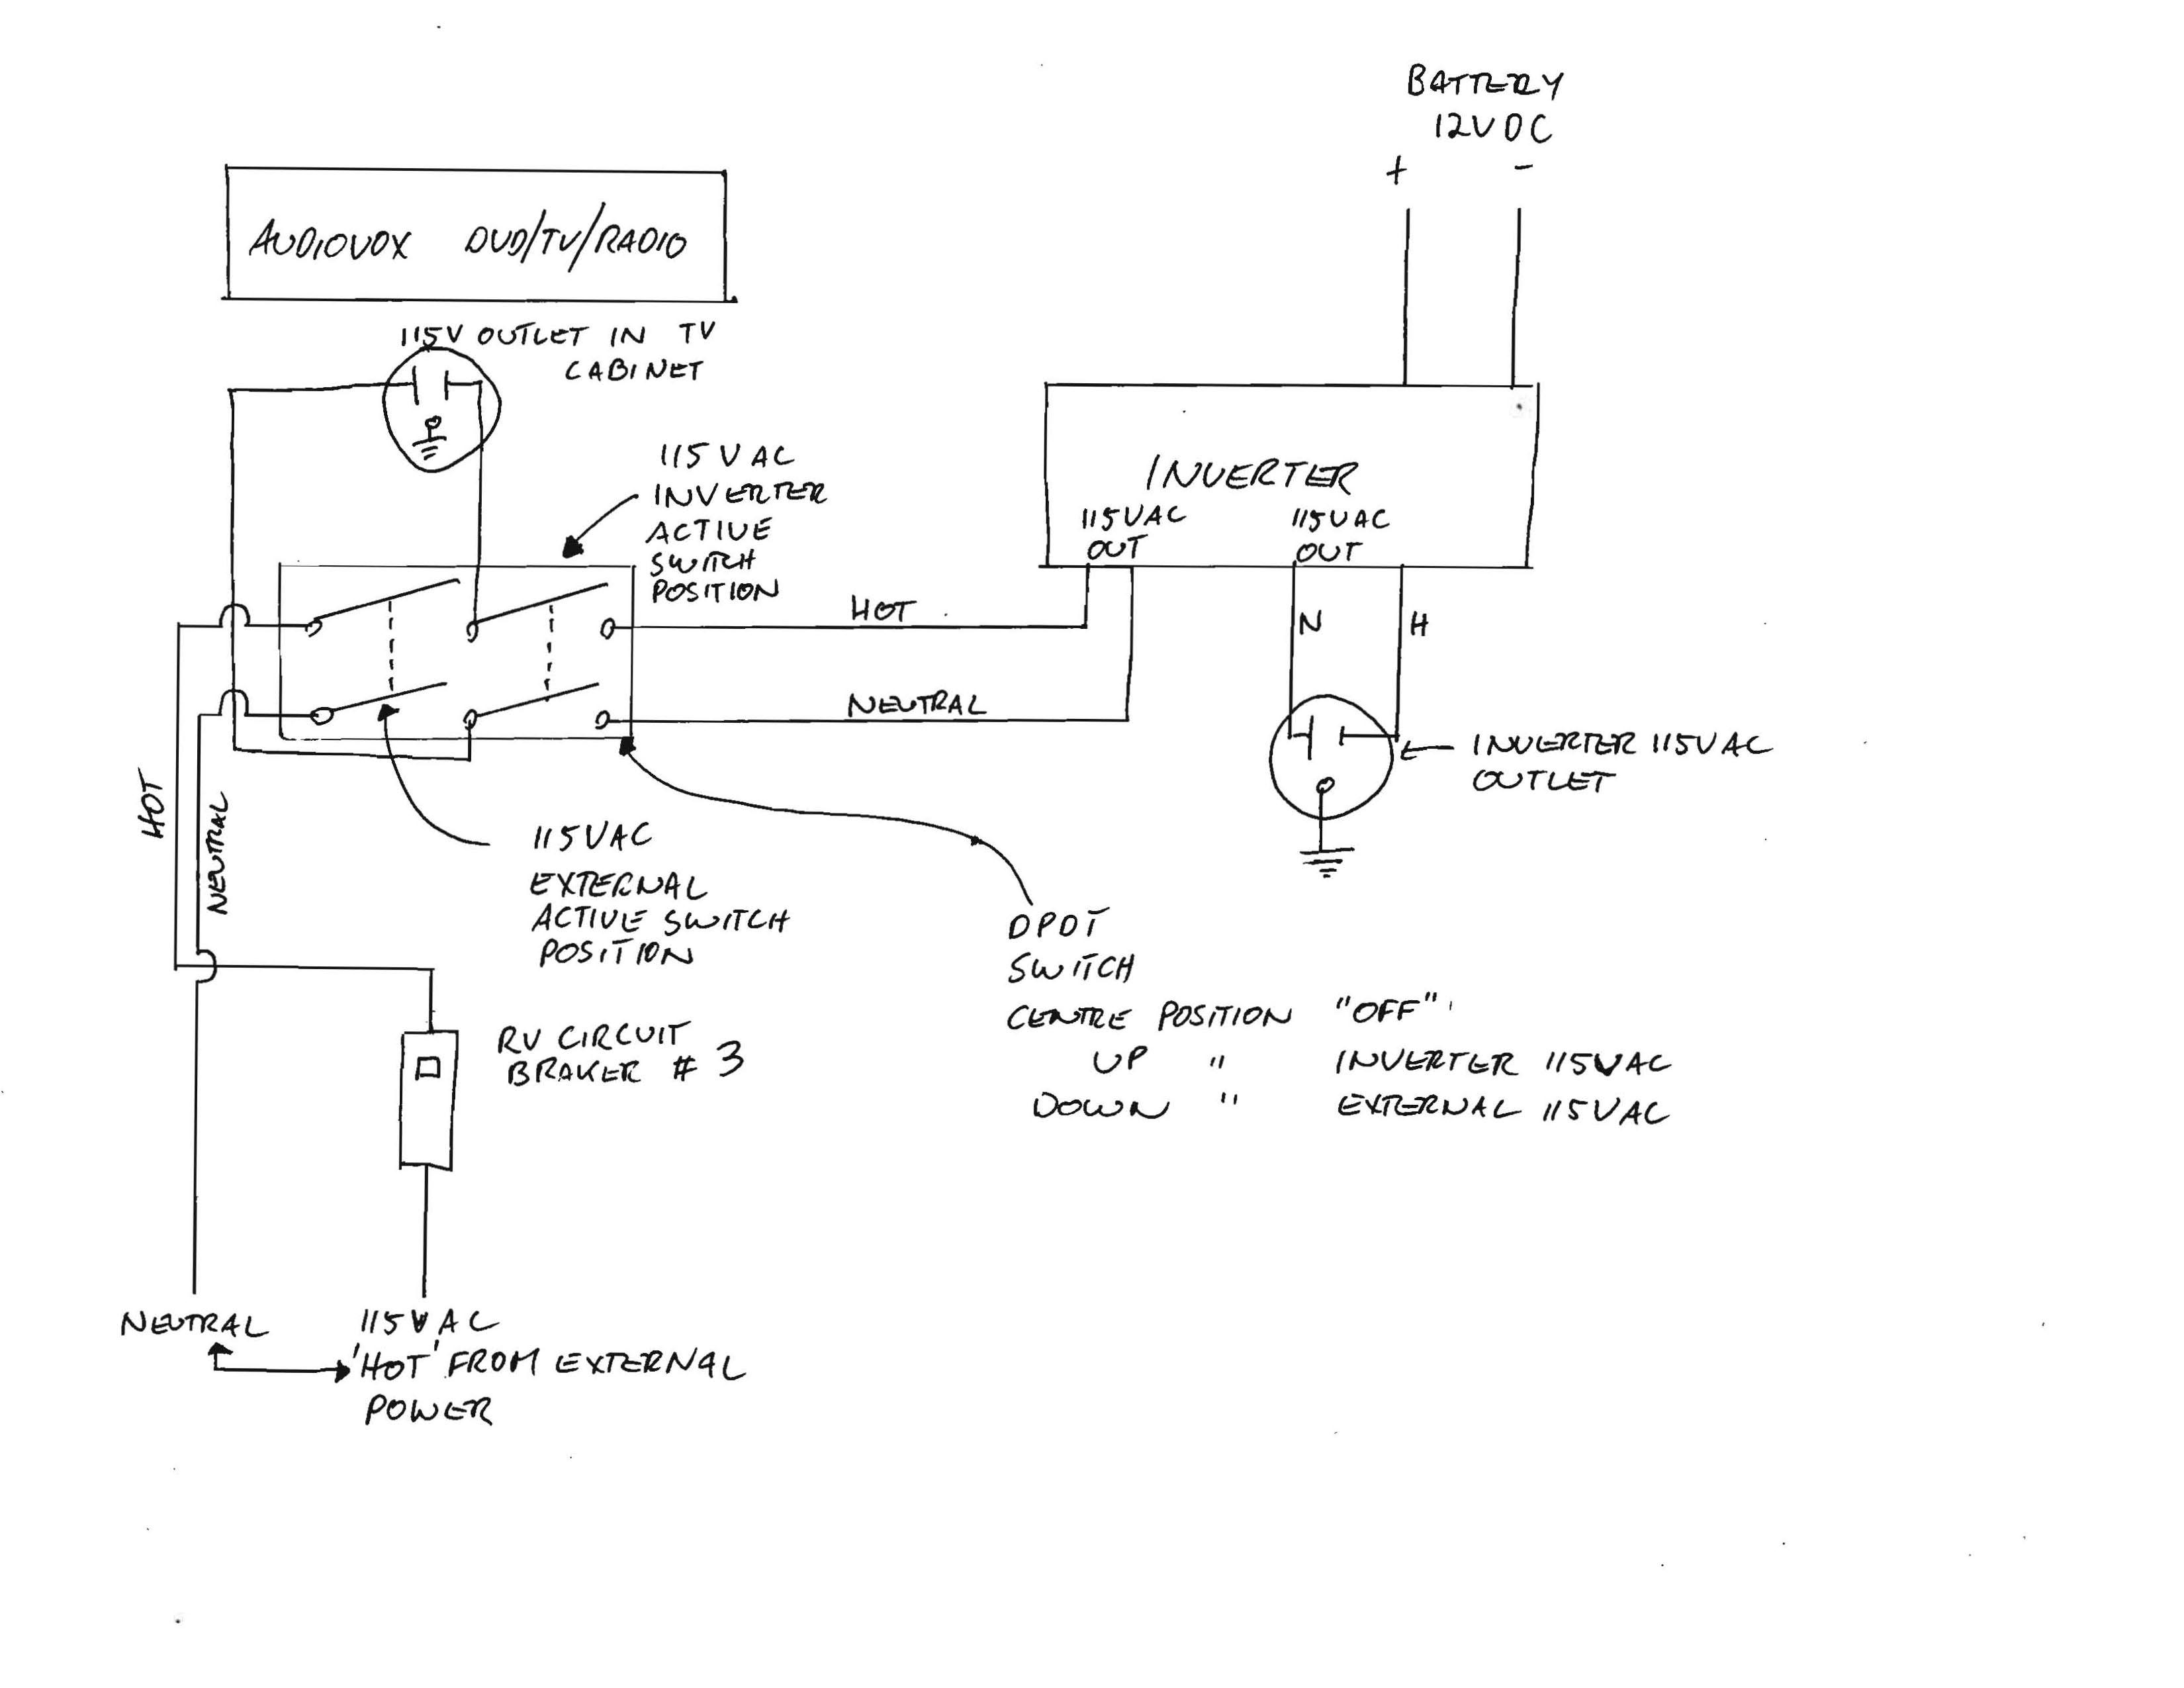 bose companion 5 wiring diagram r pod wiring diagram wiring diagrams site  r pod wiring diagram wiring diagrams site